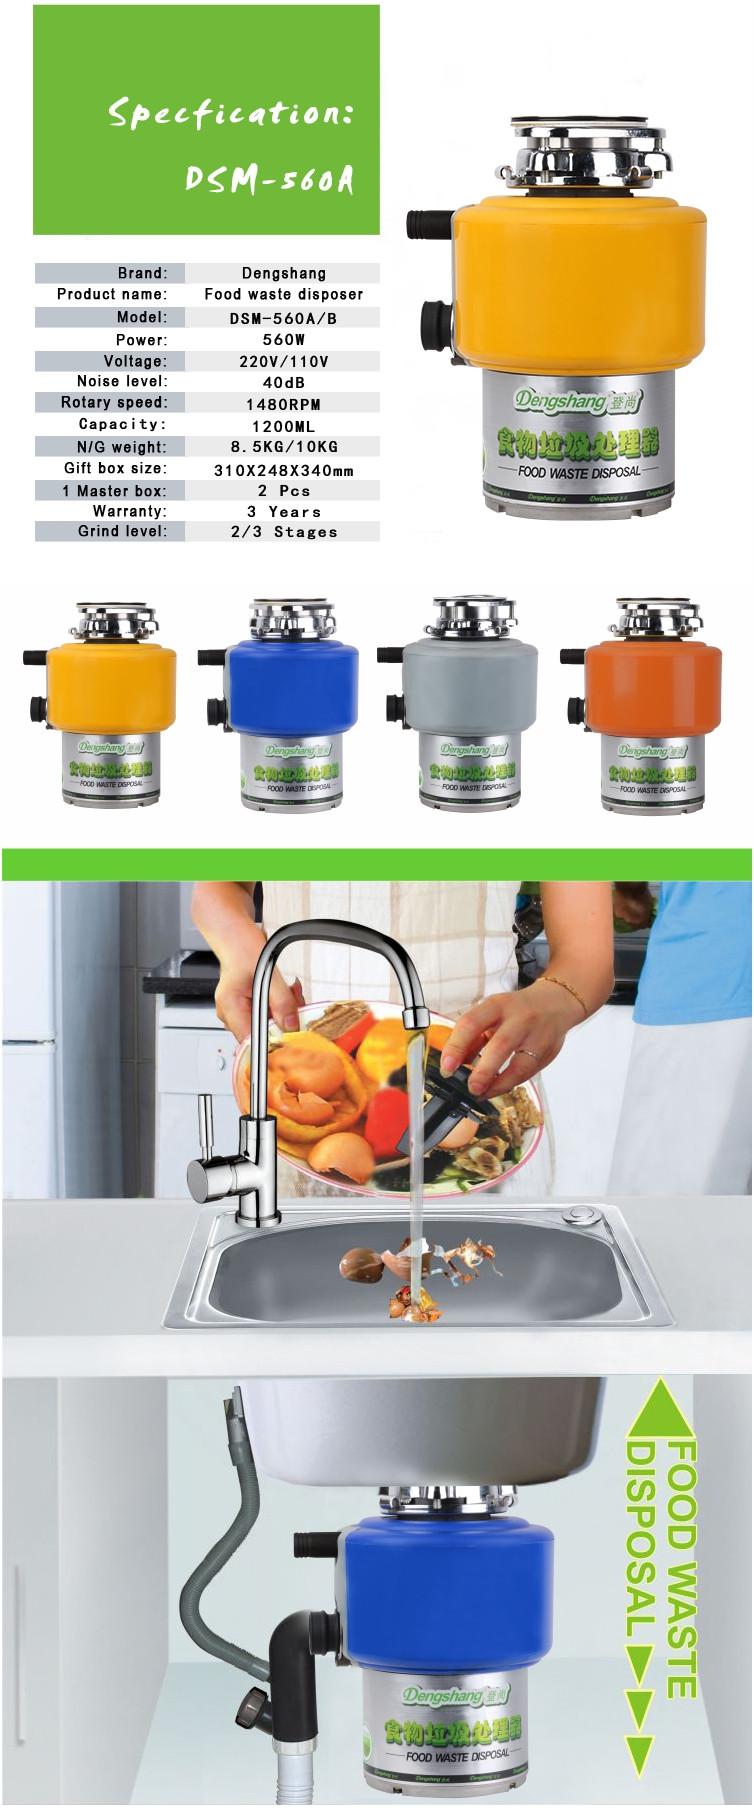 Uncategorized Chinese Kitchen Appliances reliable chinese kitchen appliances waste disposer manufacturer manufacturer